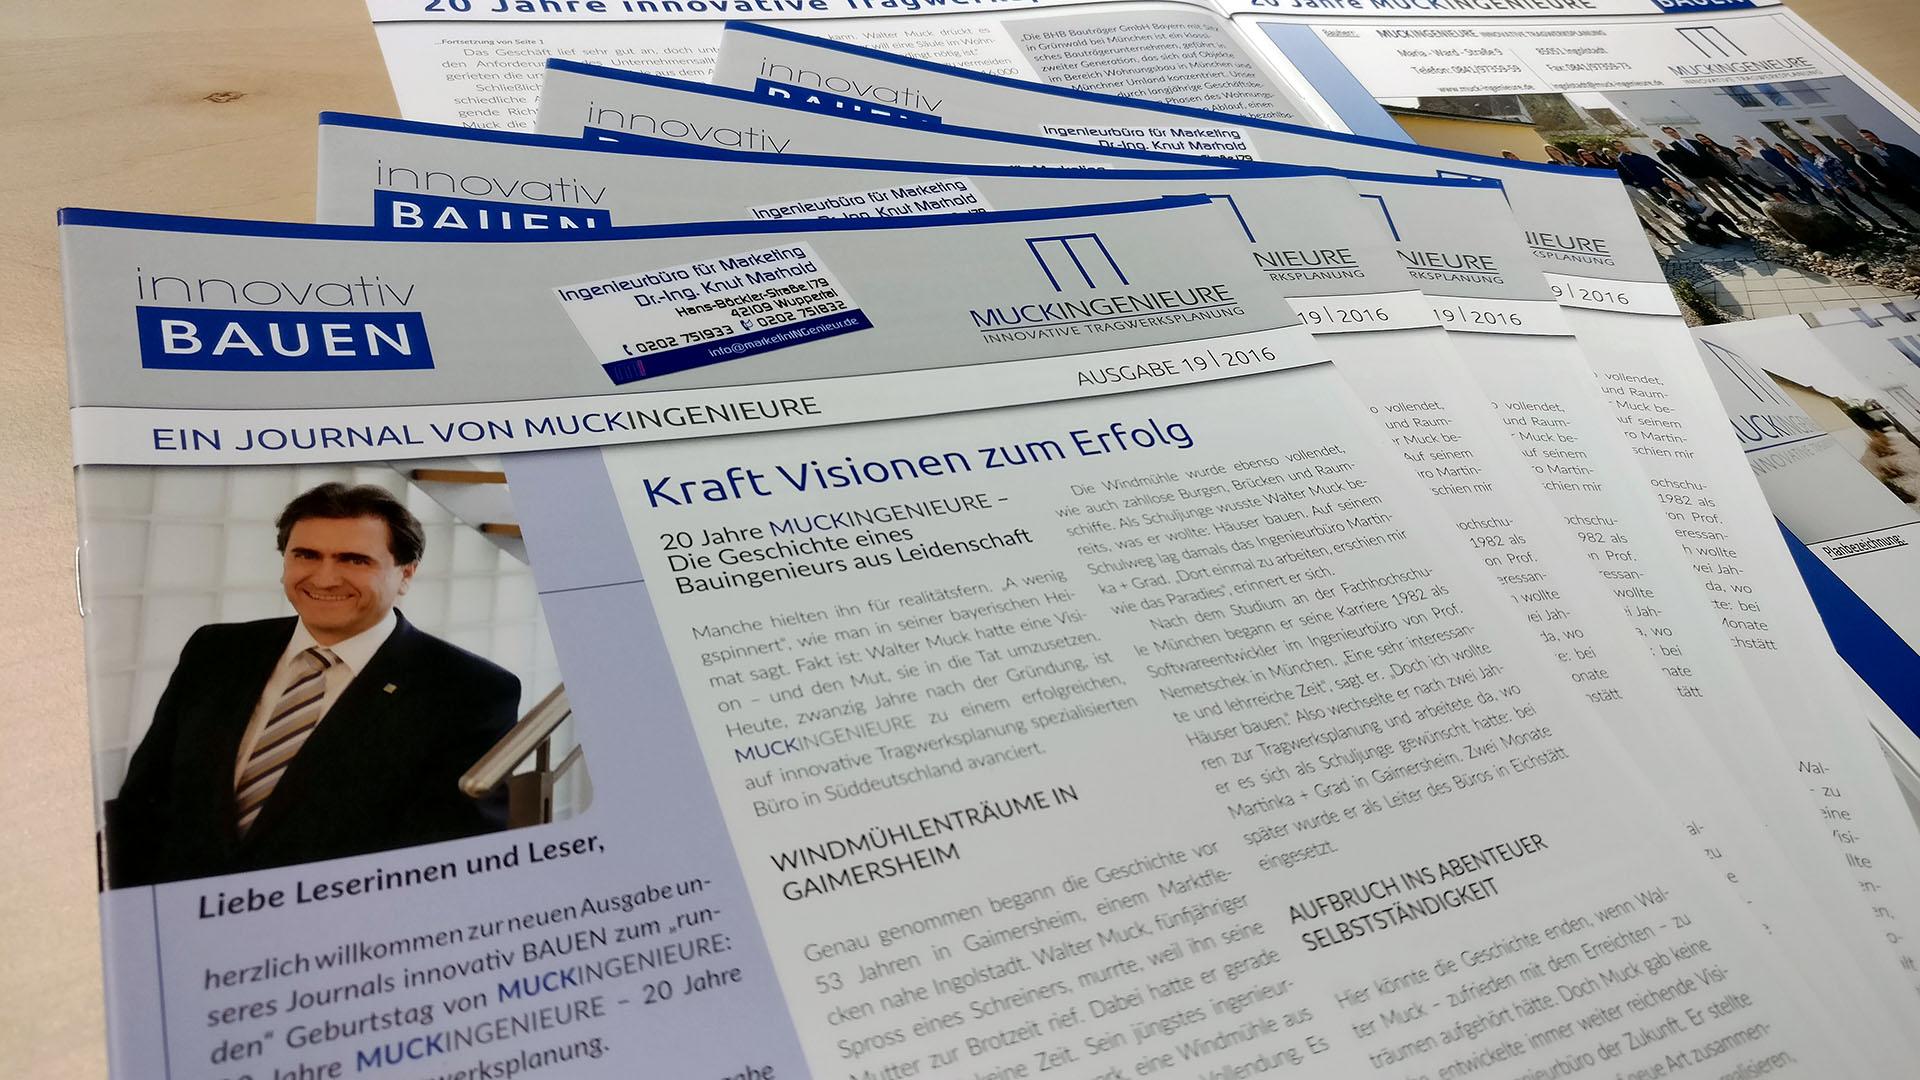 KundenJournal MUCKINGENIEURE Innovative Tragwerksplanung - innovativ BAUEN